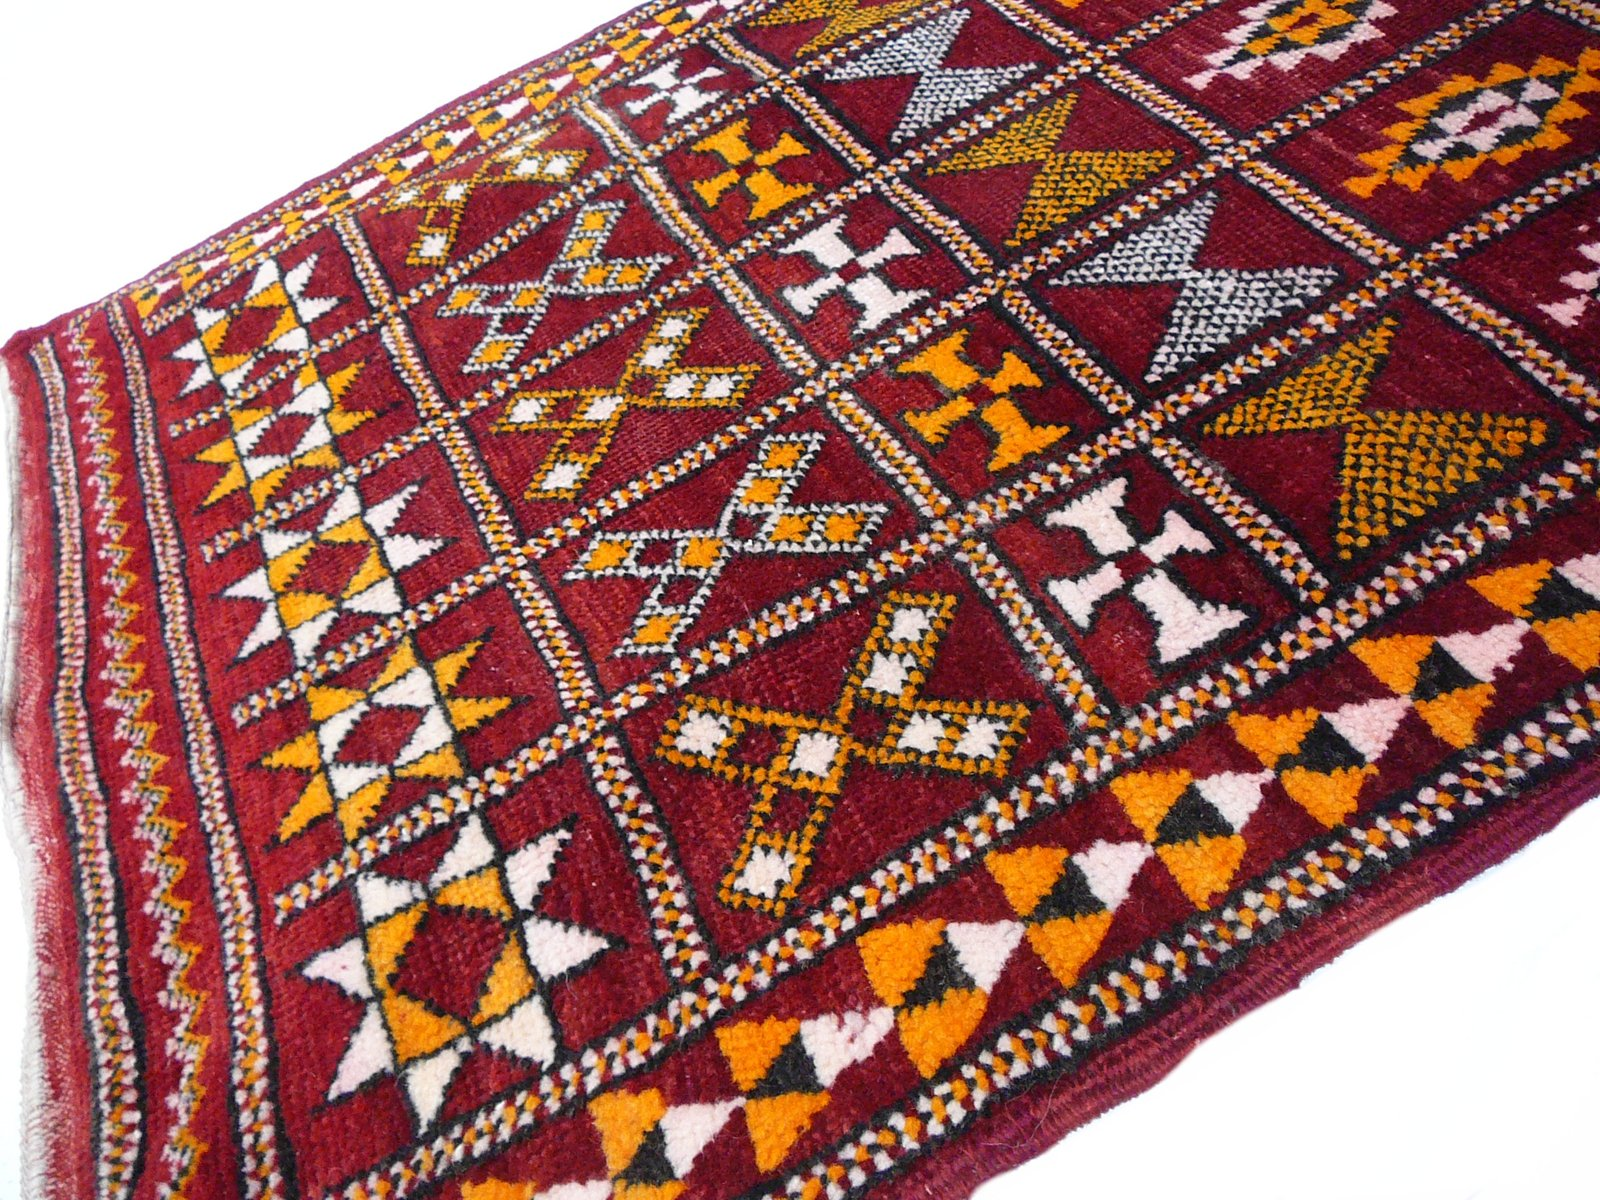 Vintage Moroccan Zemmour Berber Rug For Sale At Pamono